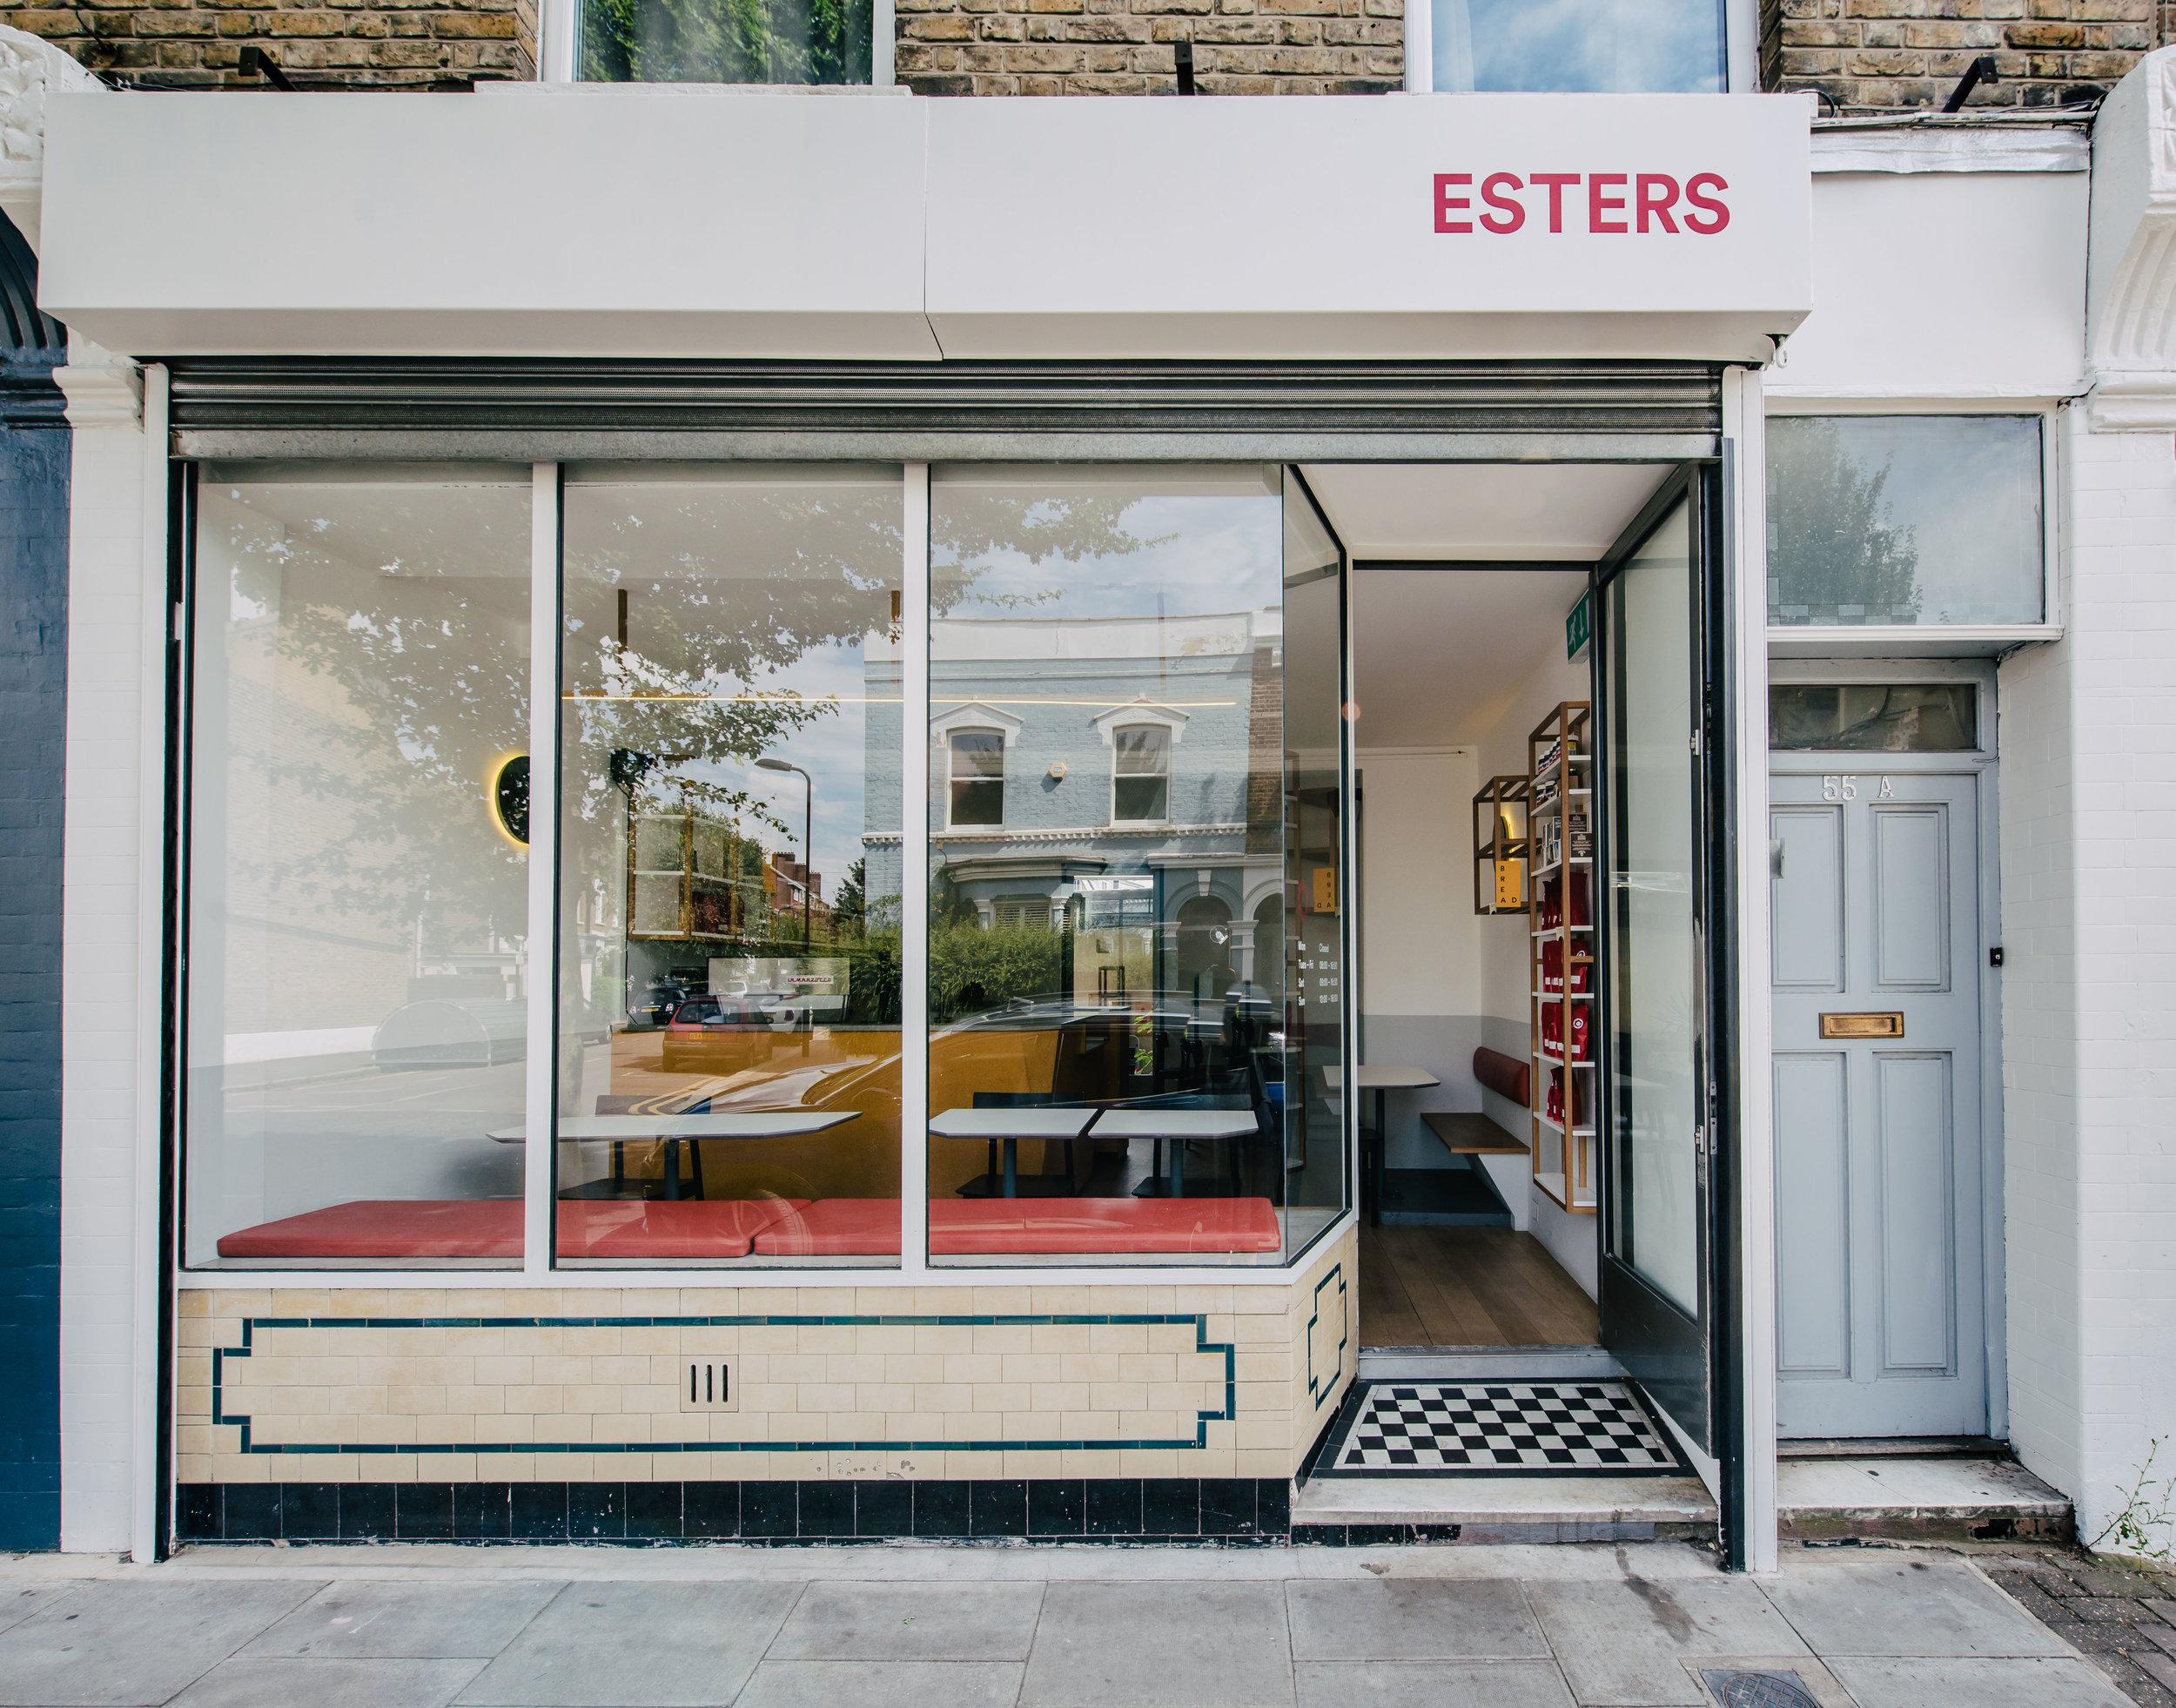 Esters High Res 1.1.jpg